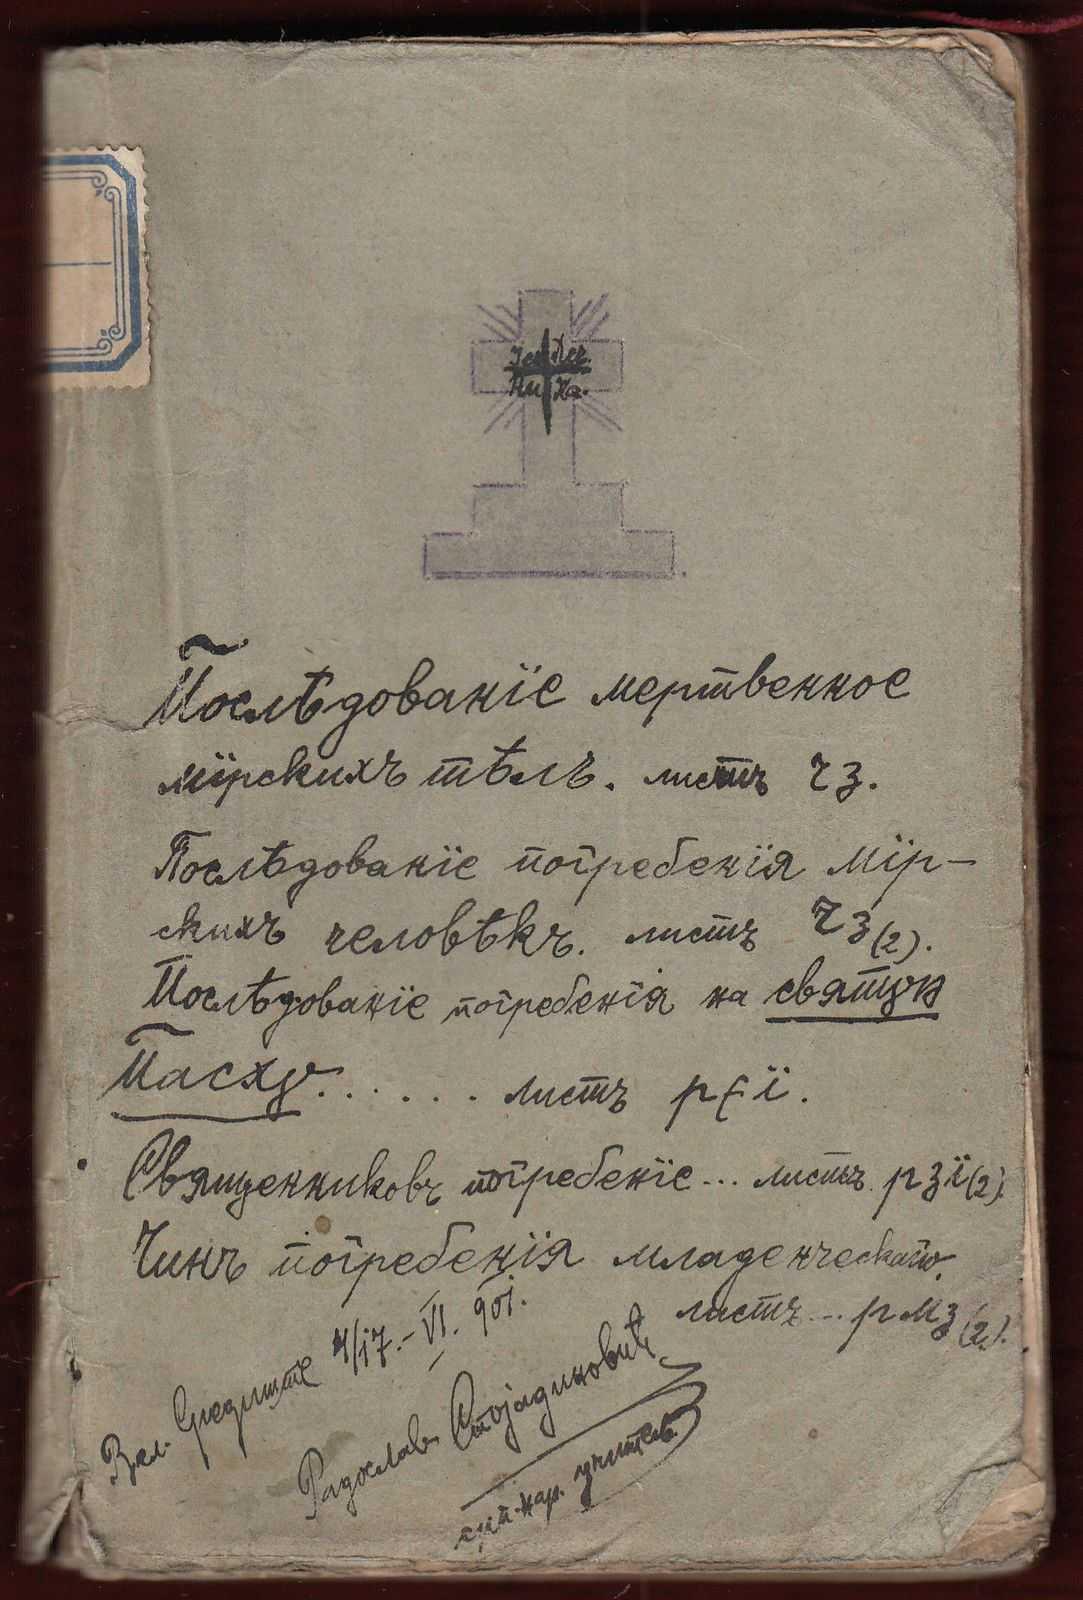 19c-Posledovanie-Acolouthia-e-Old-Slavonic-Inscribed-Manuscript-401146479031